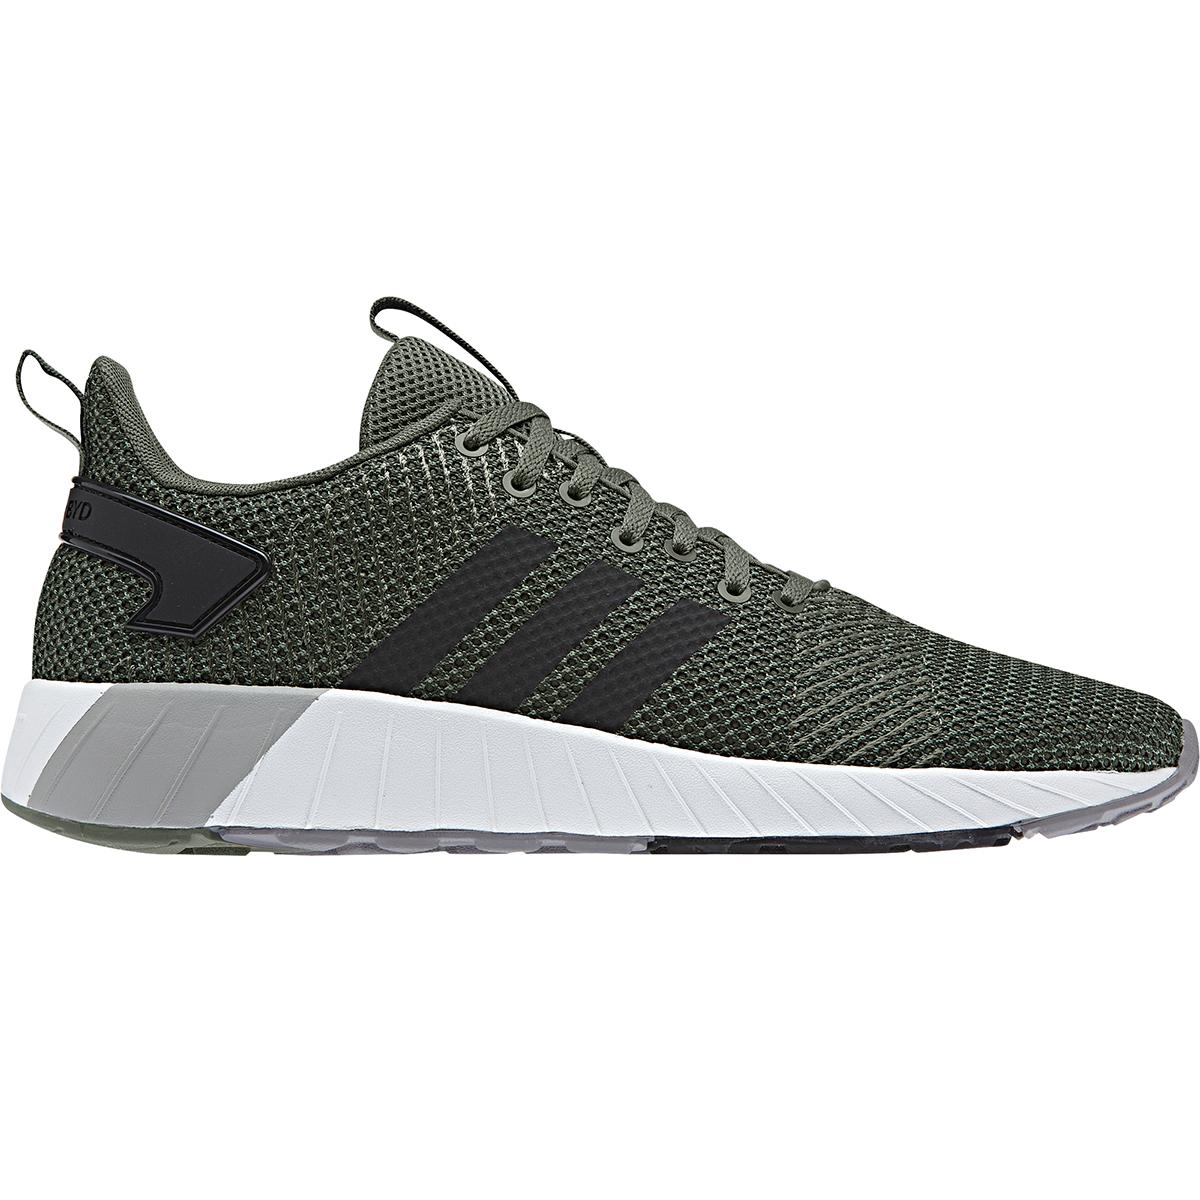 Adidas Men's Questar Byd Running Shoes - Green, 10